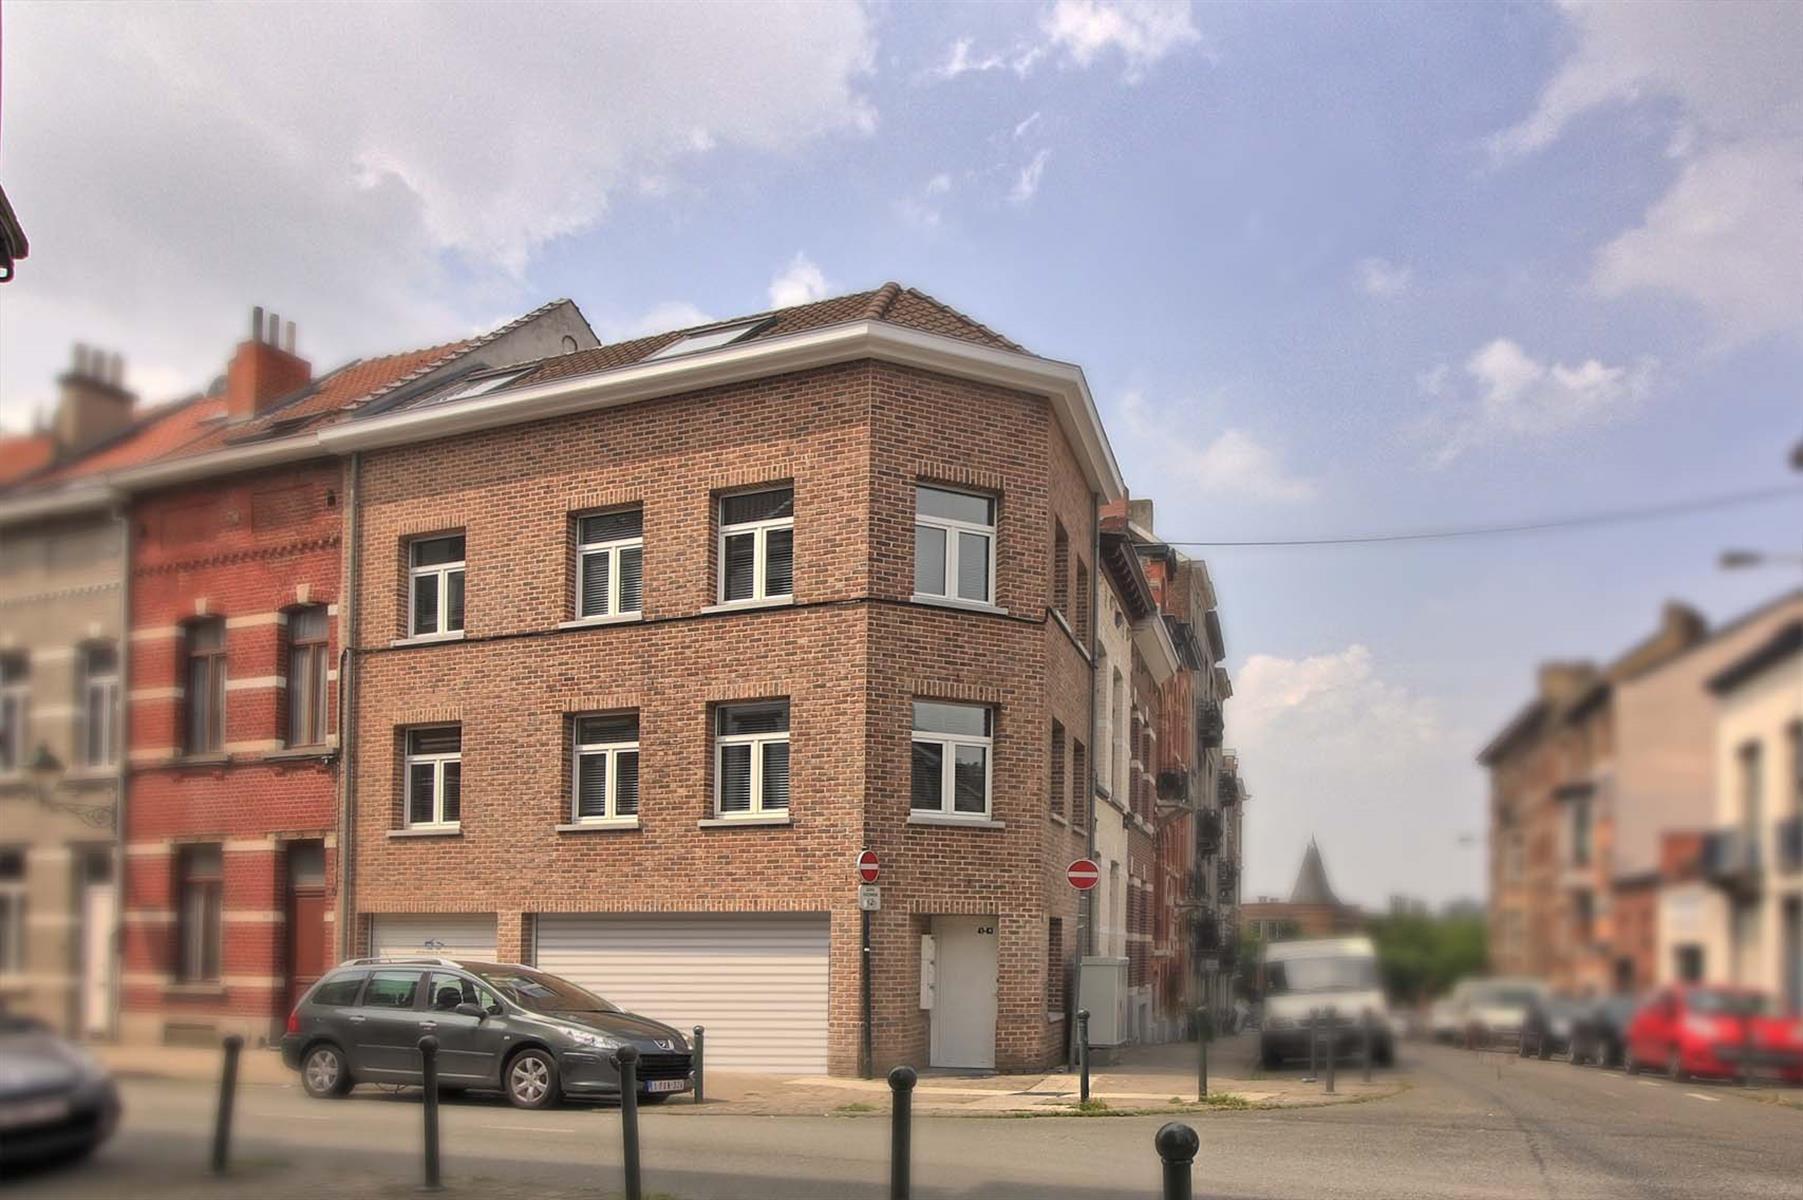 Flat - Etterbeek - #4277250-0